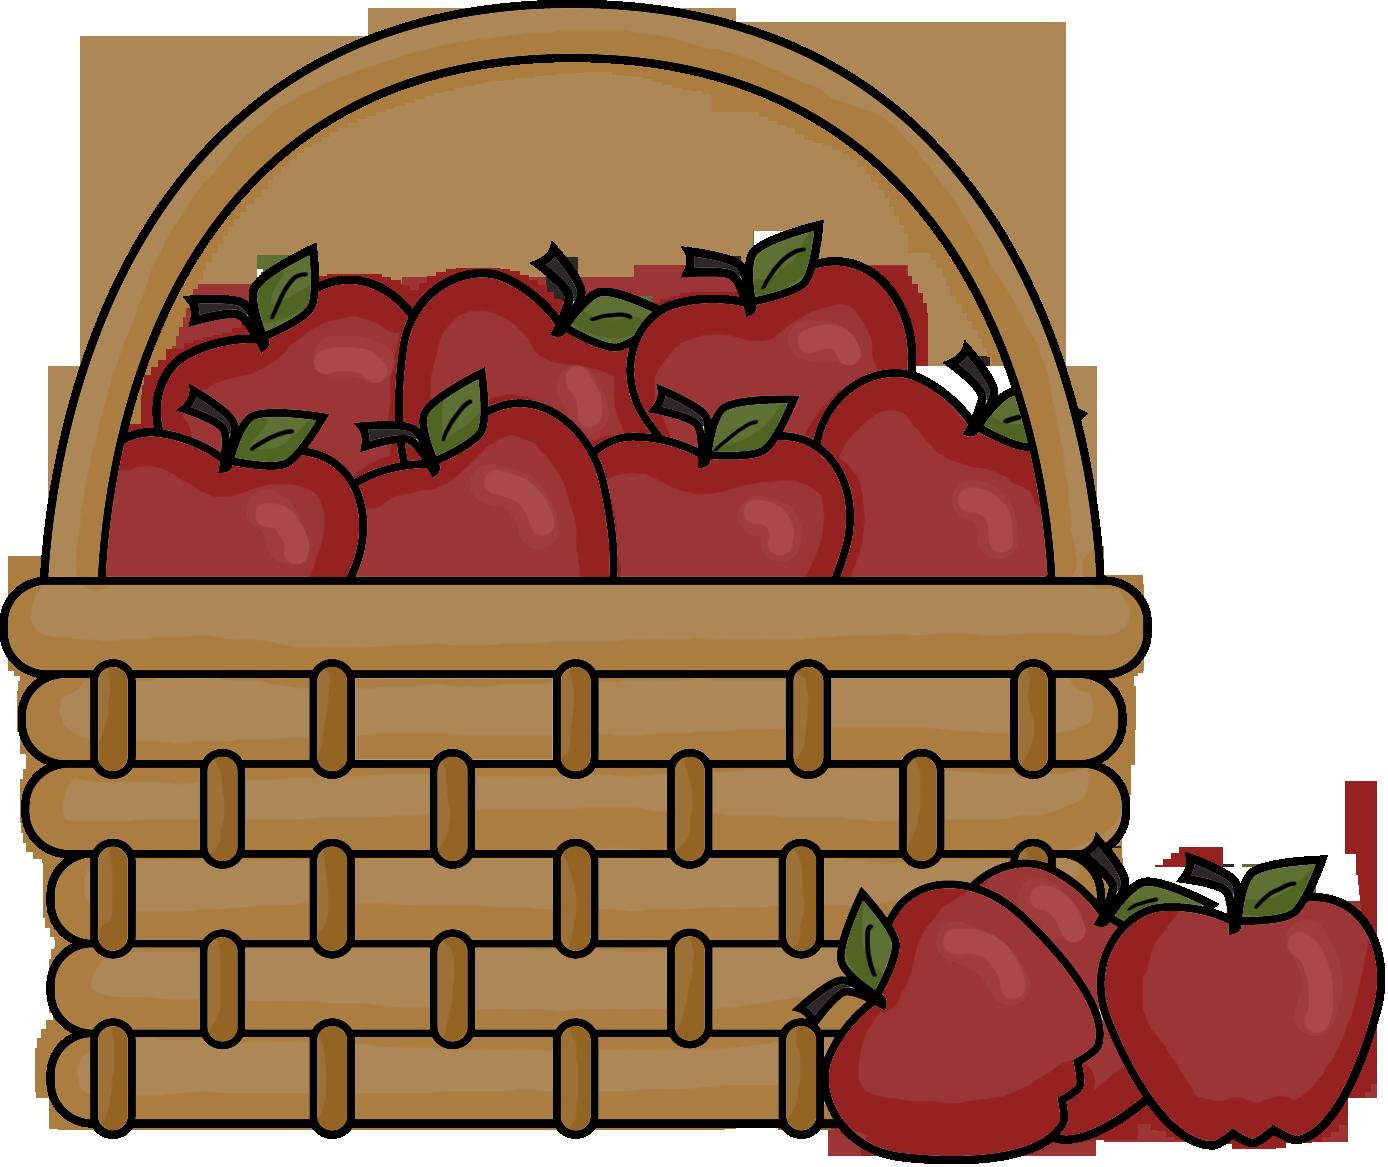 Kids with apples clipart jpg Apple Basket Clipart - Clipart Kid jpg